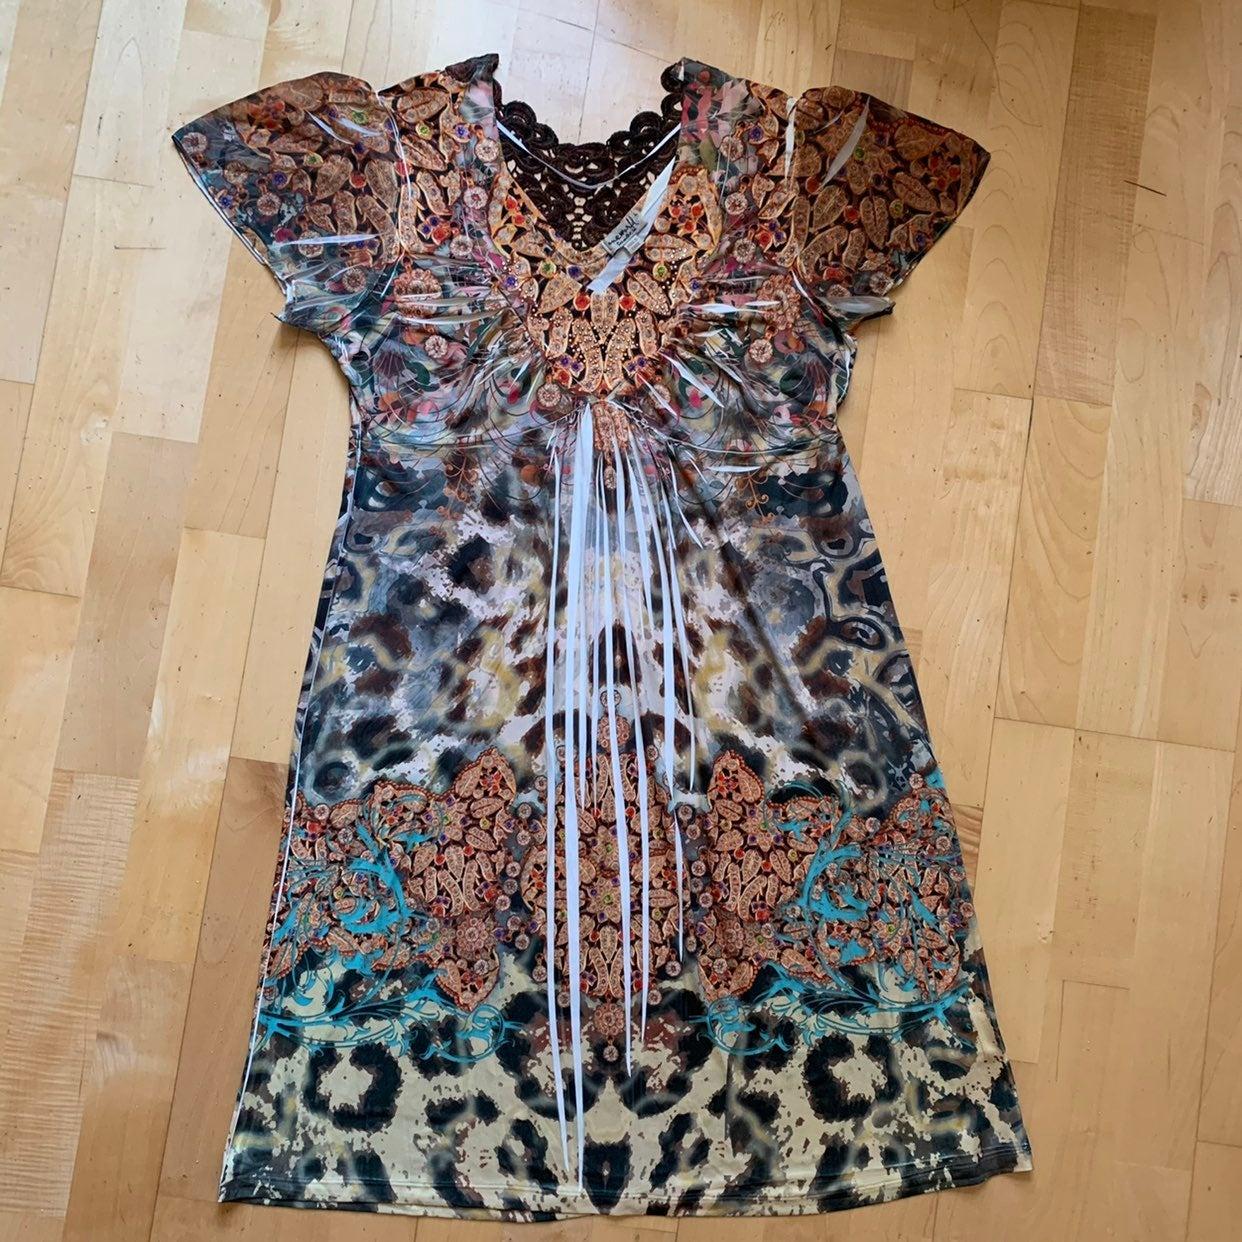 One World Cheetah and Gems Dress